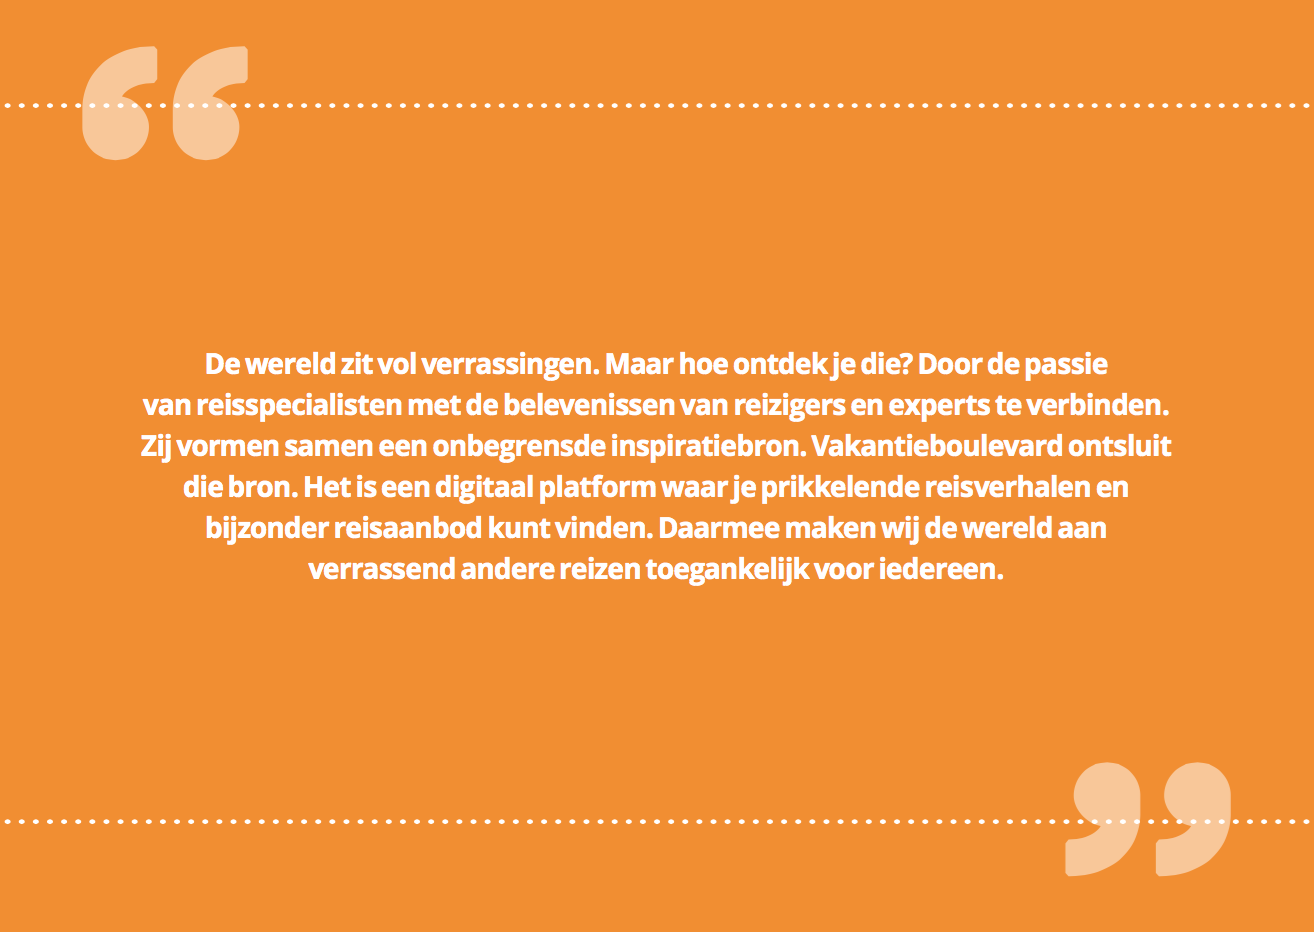 Story Vakantieboulevard.nl